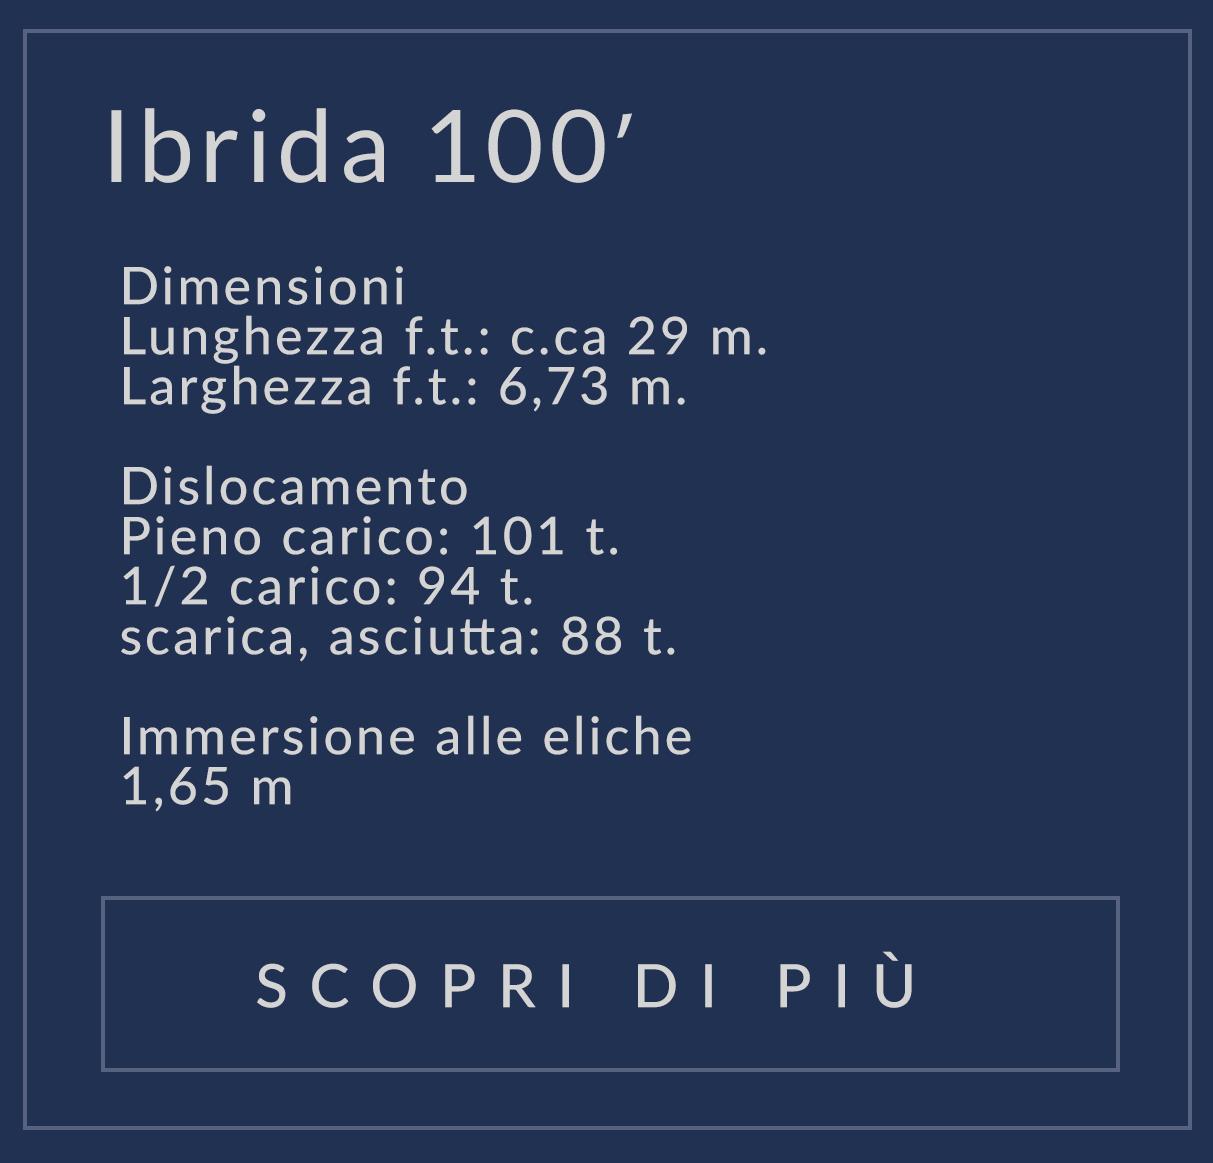 100 ib